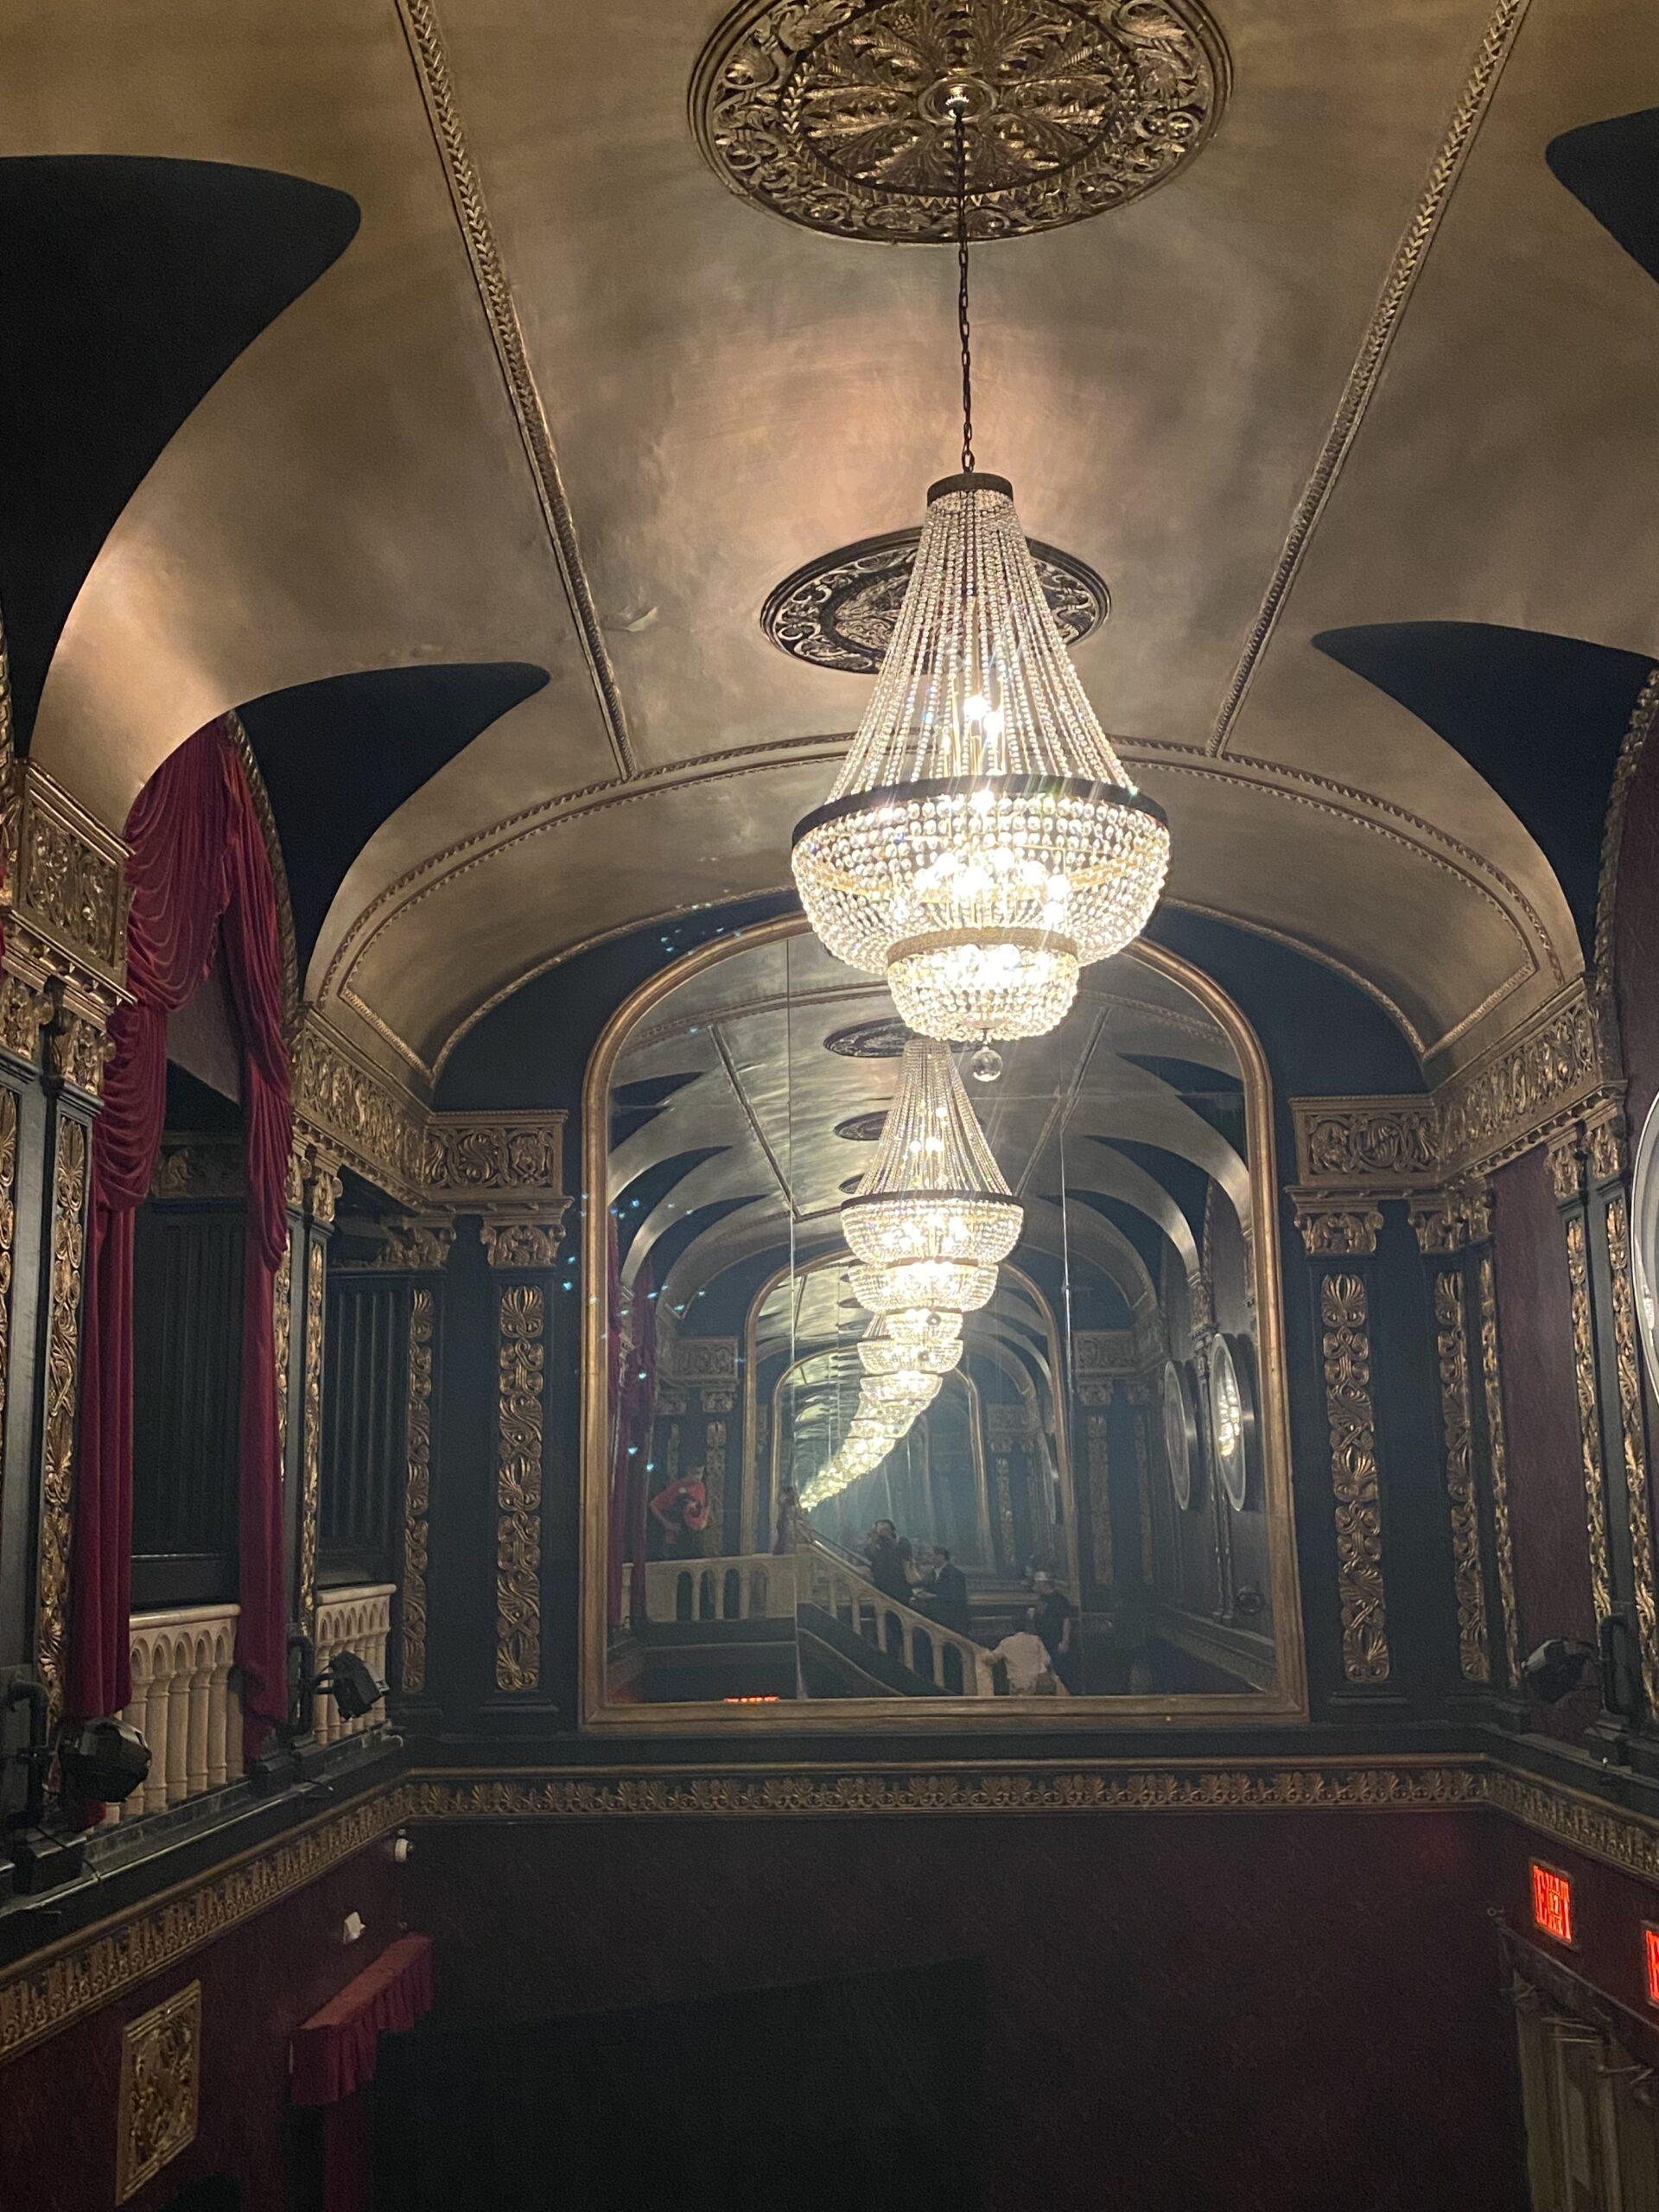 stunning interiors at the Cap